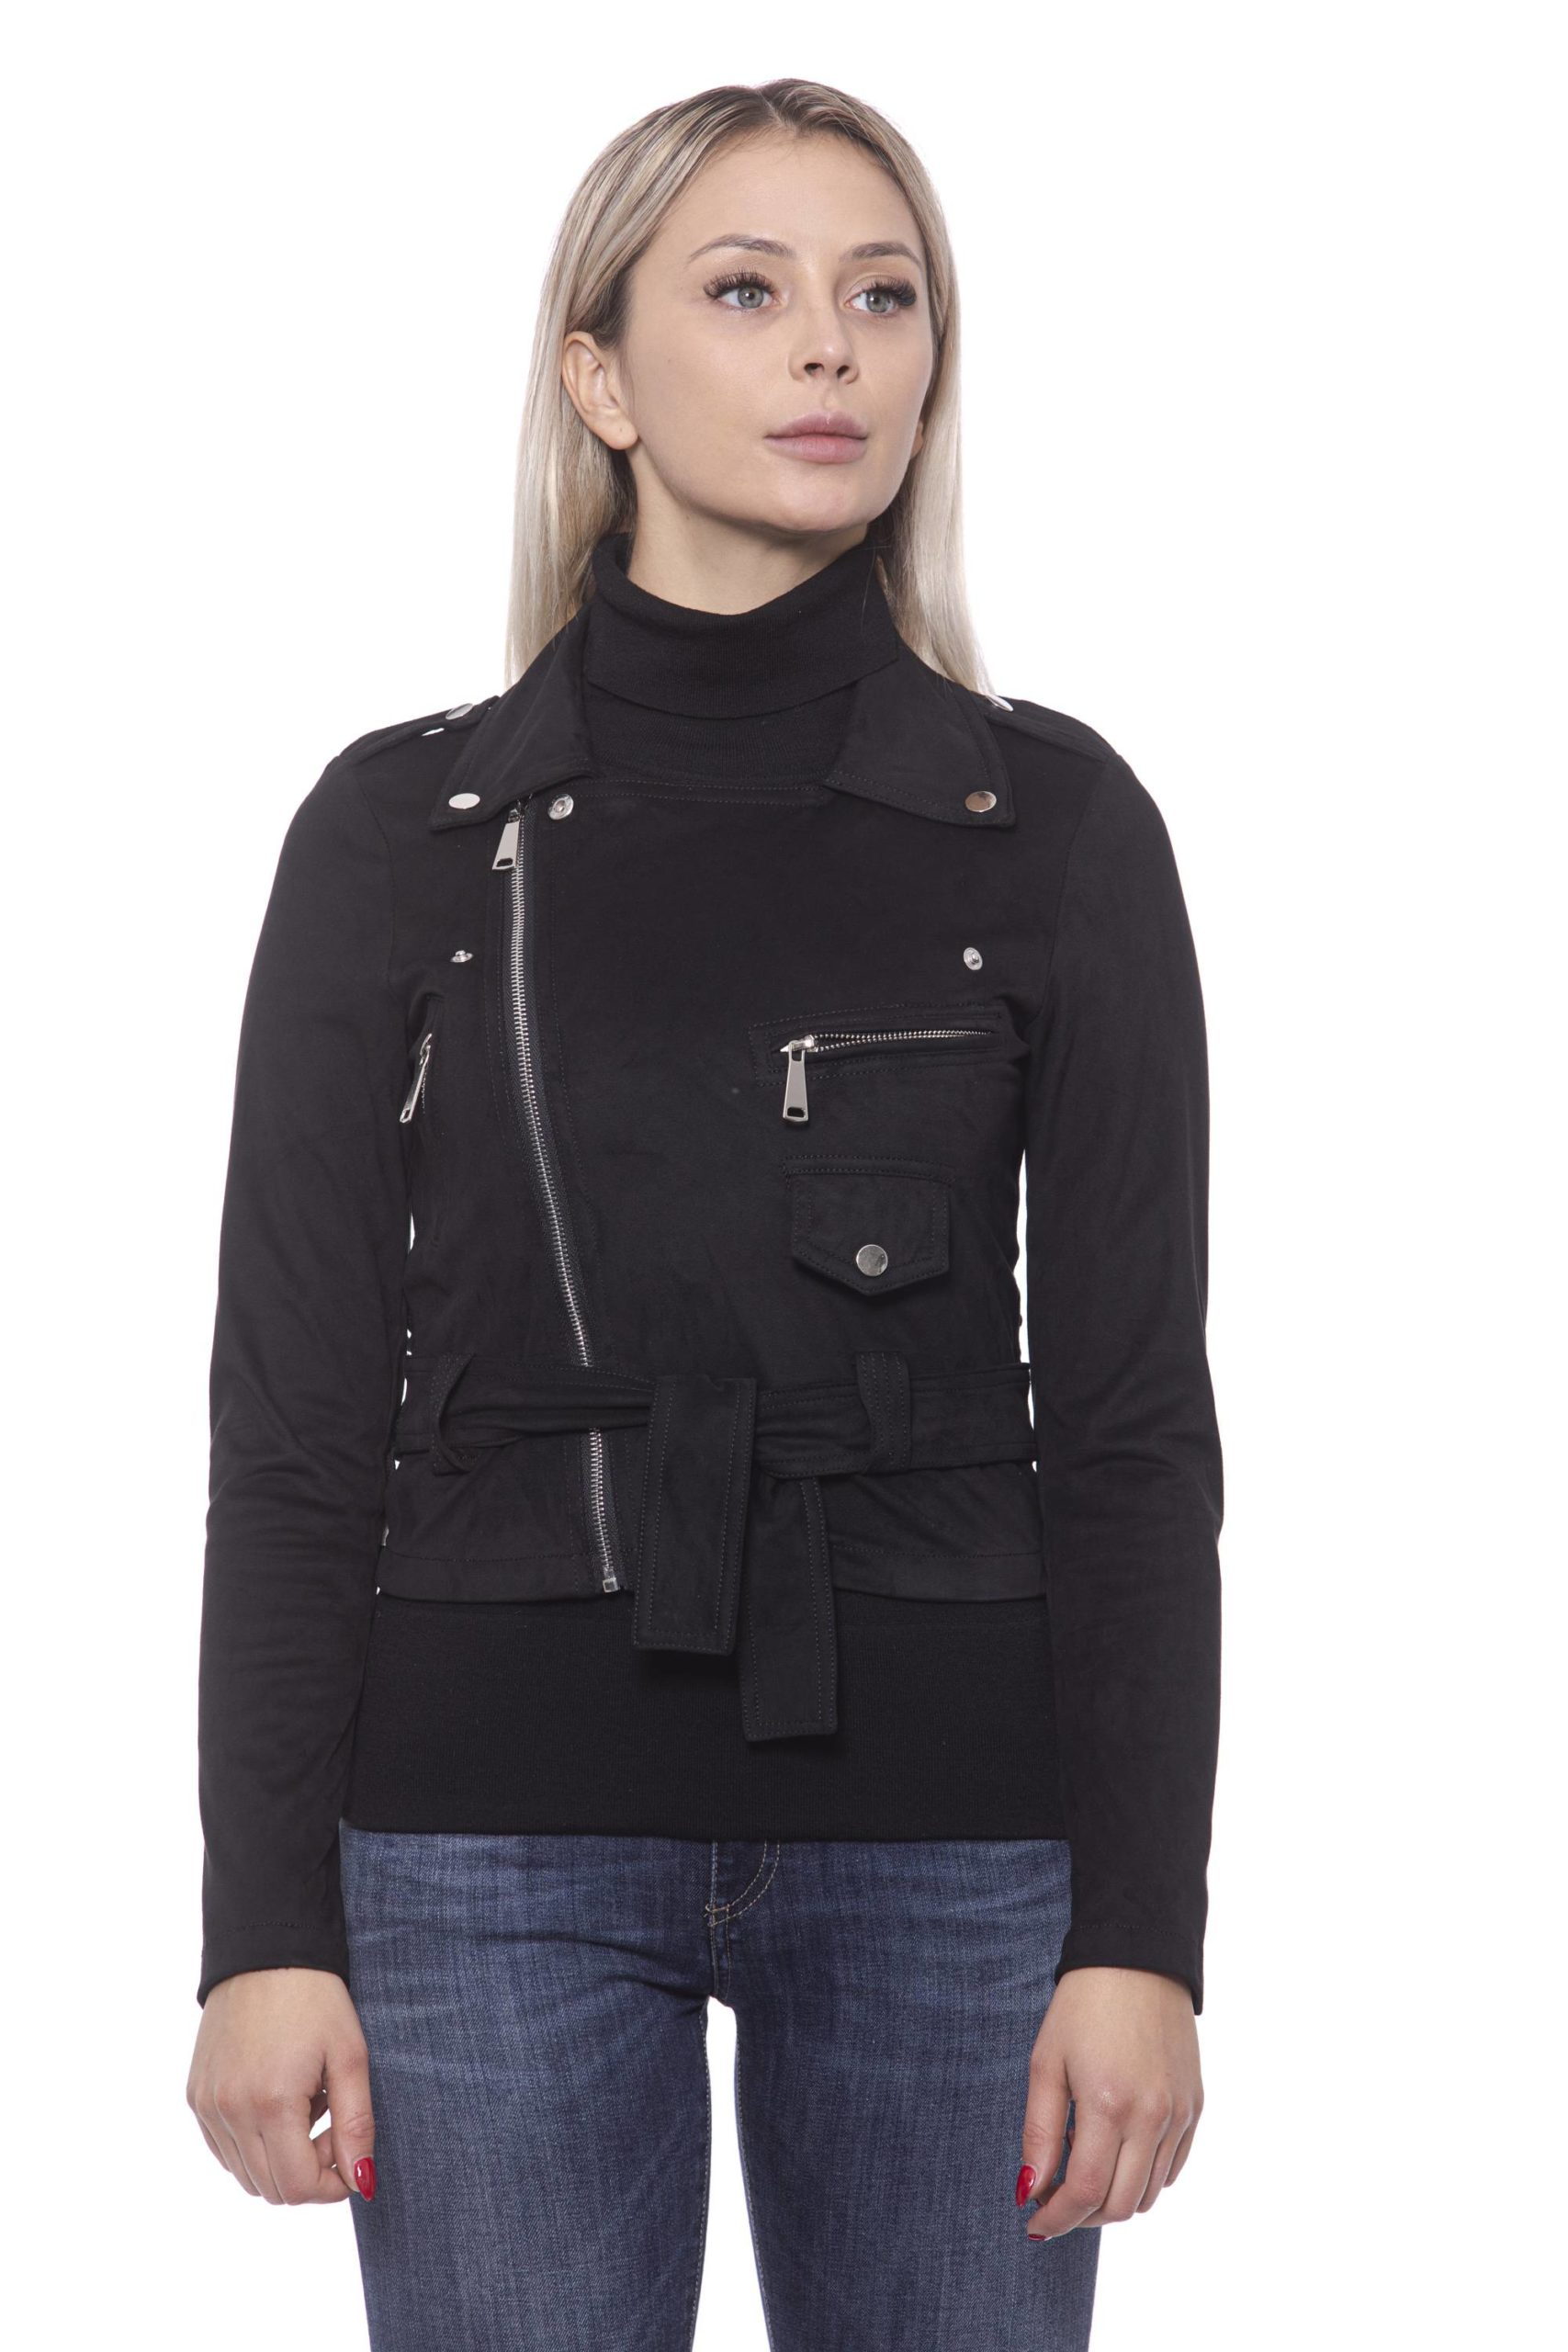 19V69 Italia Women's Nero Jacket 191388444 - IT42 | S